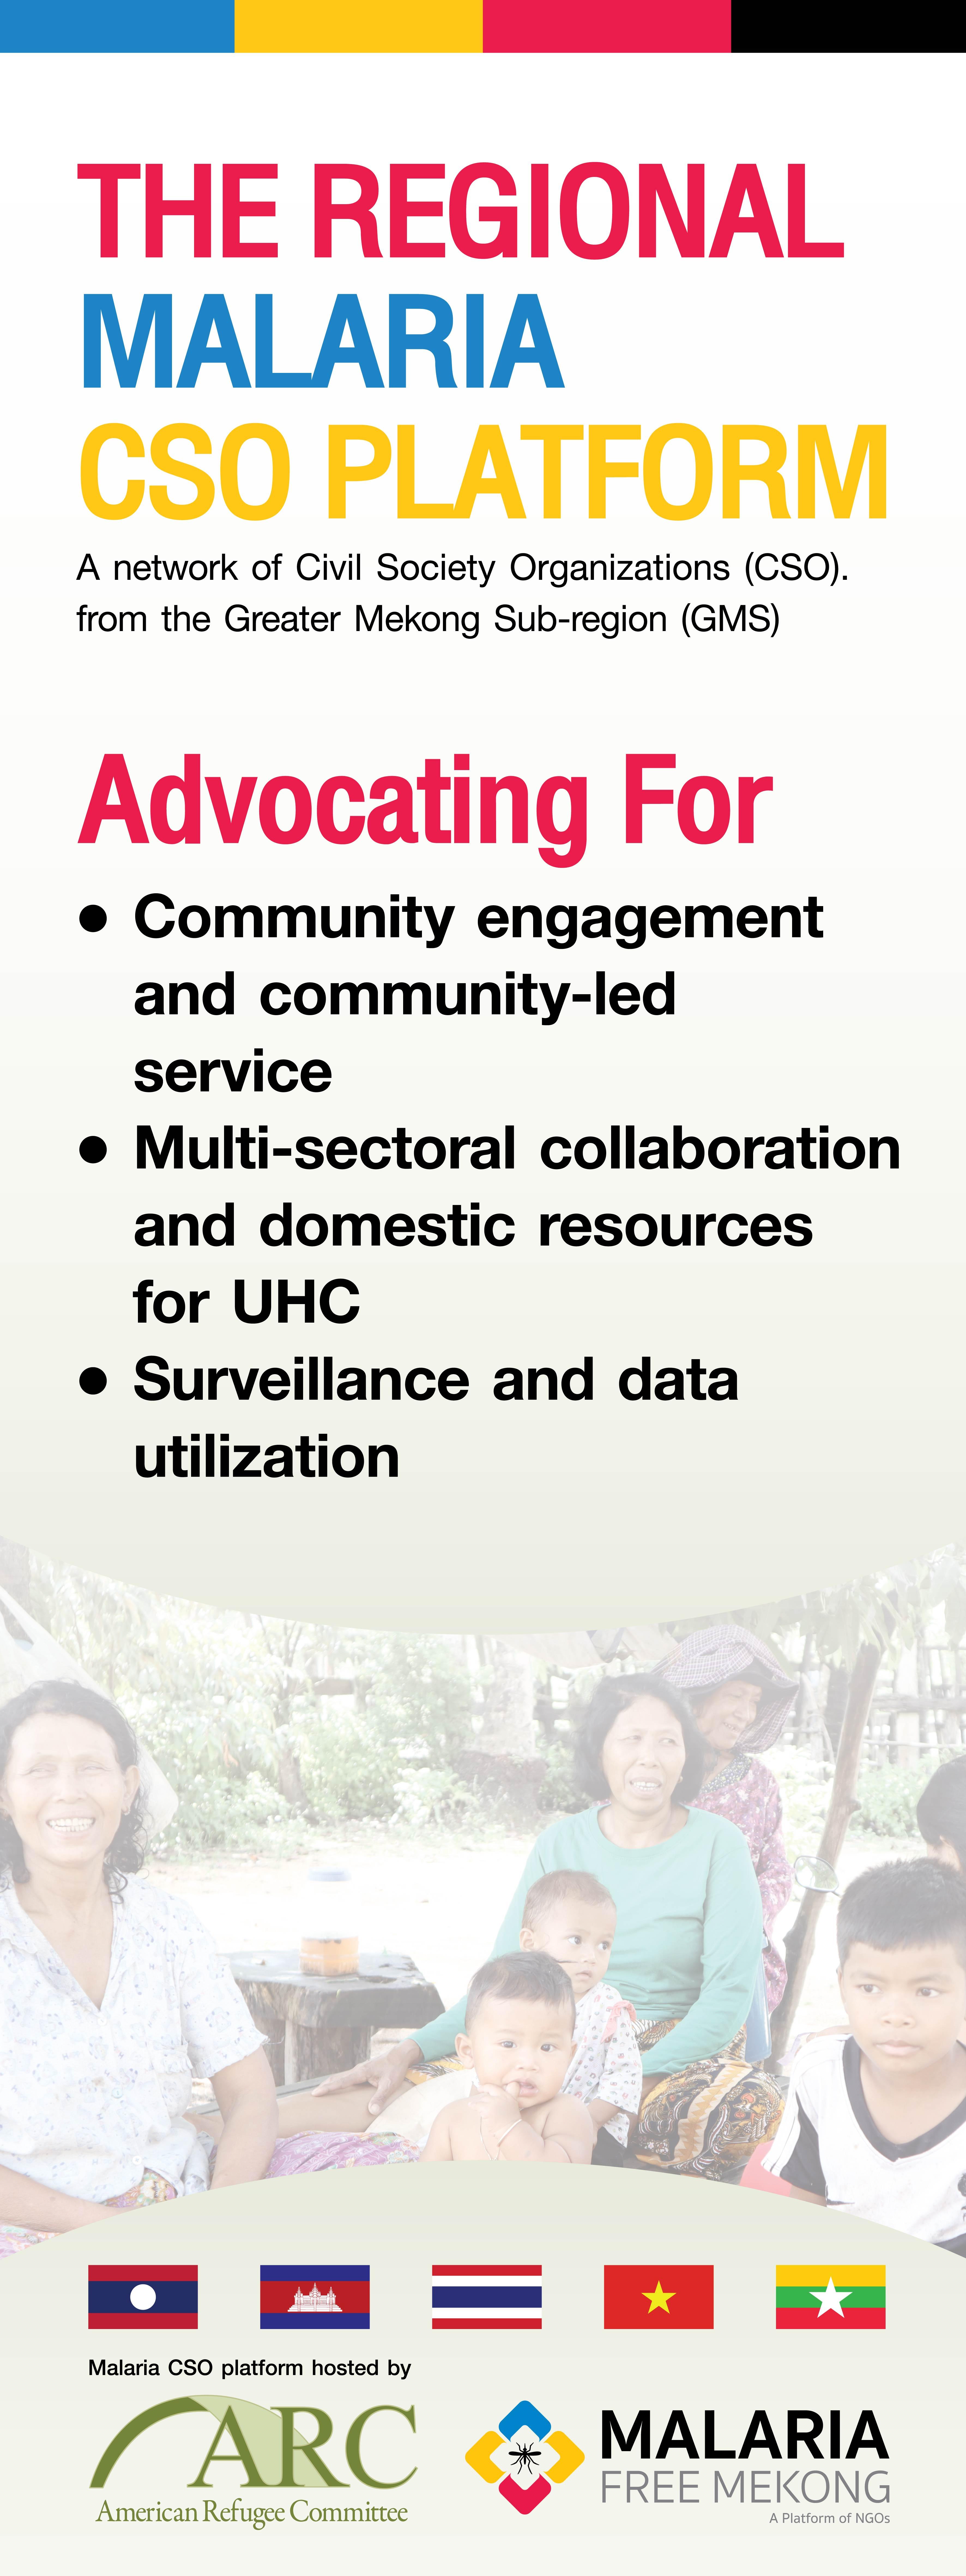 ADVOCACY | Malaria CSO Platform, GMS